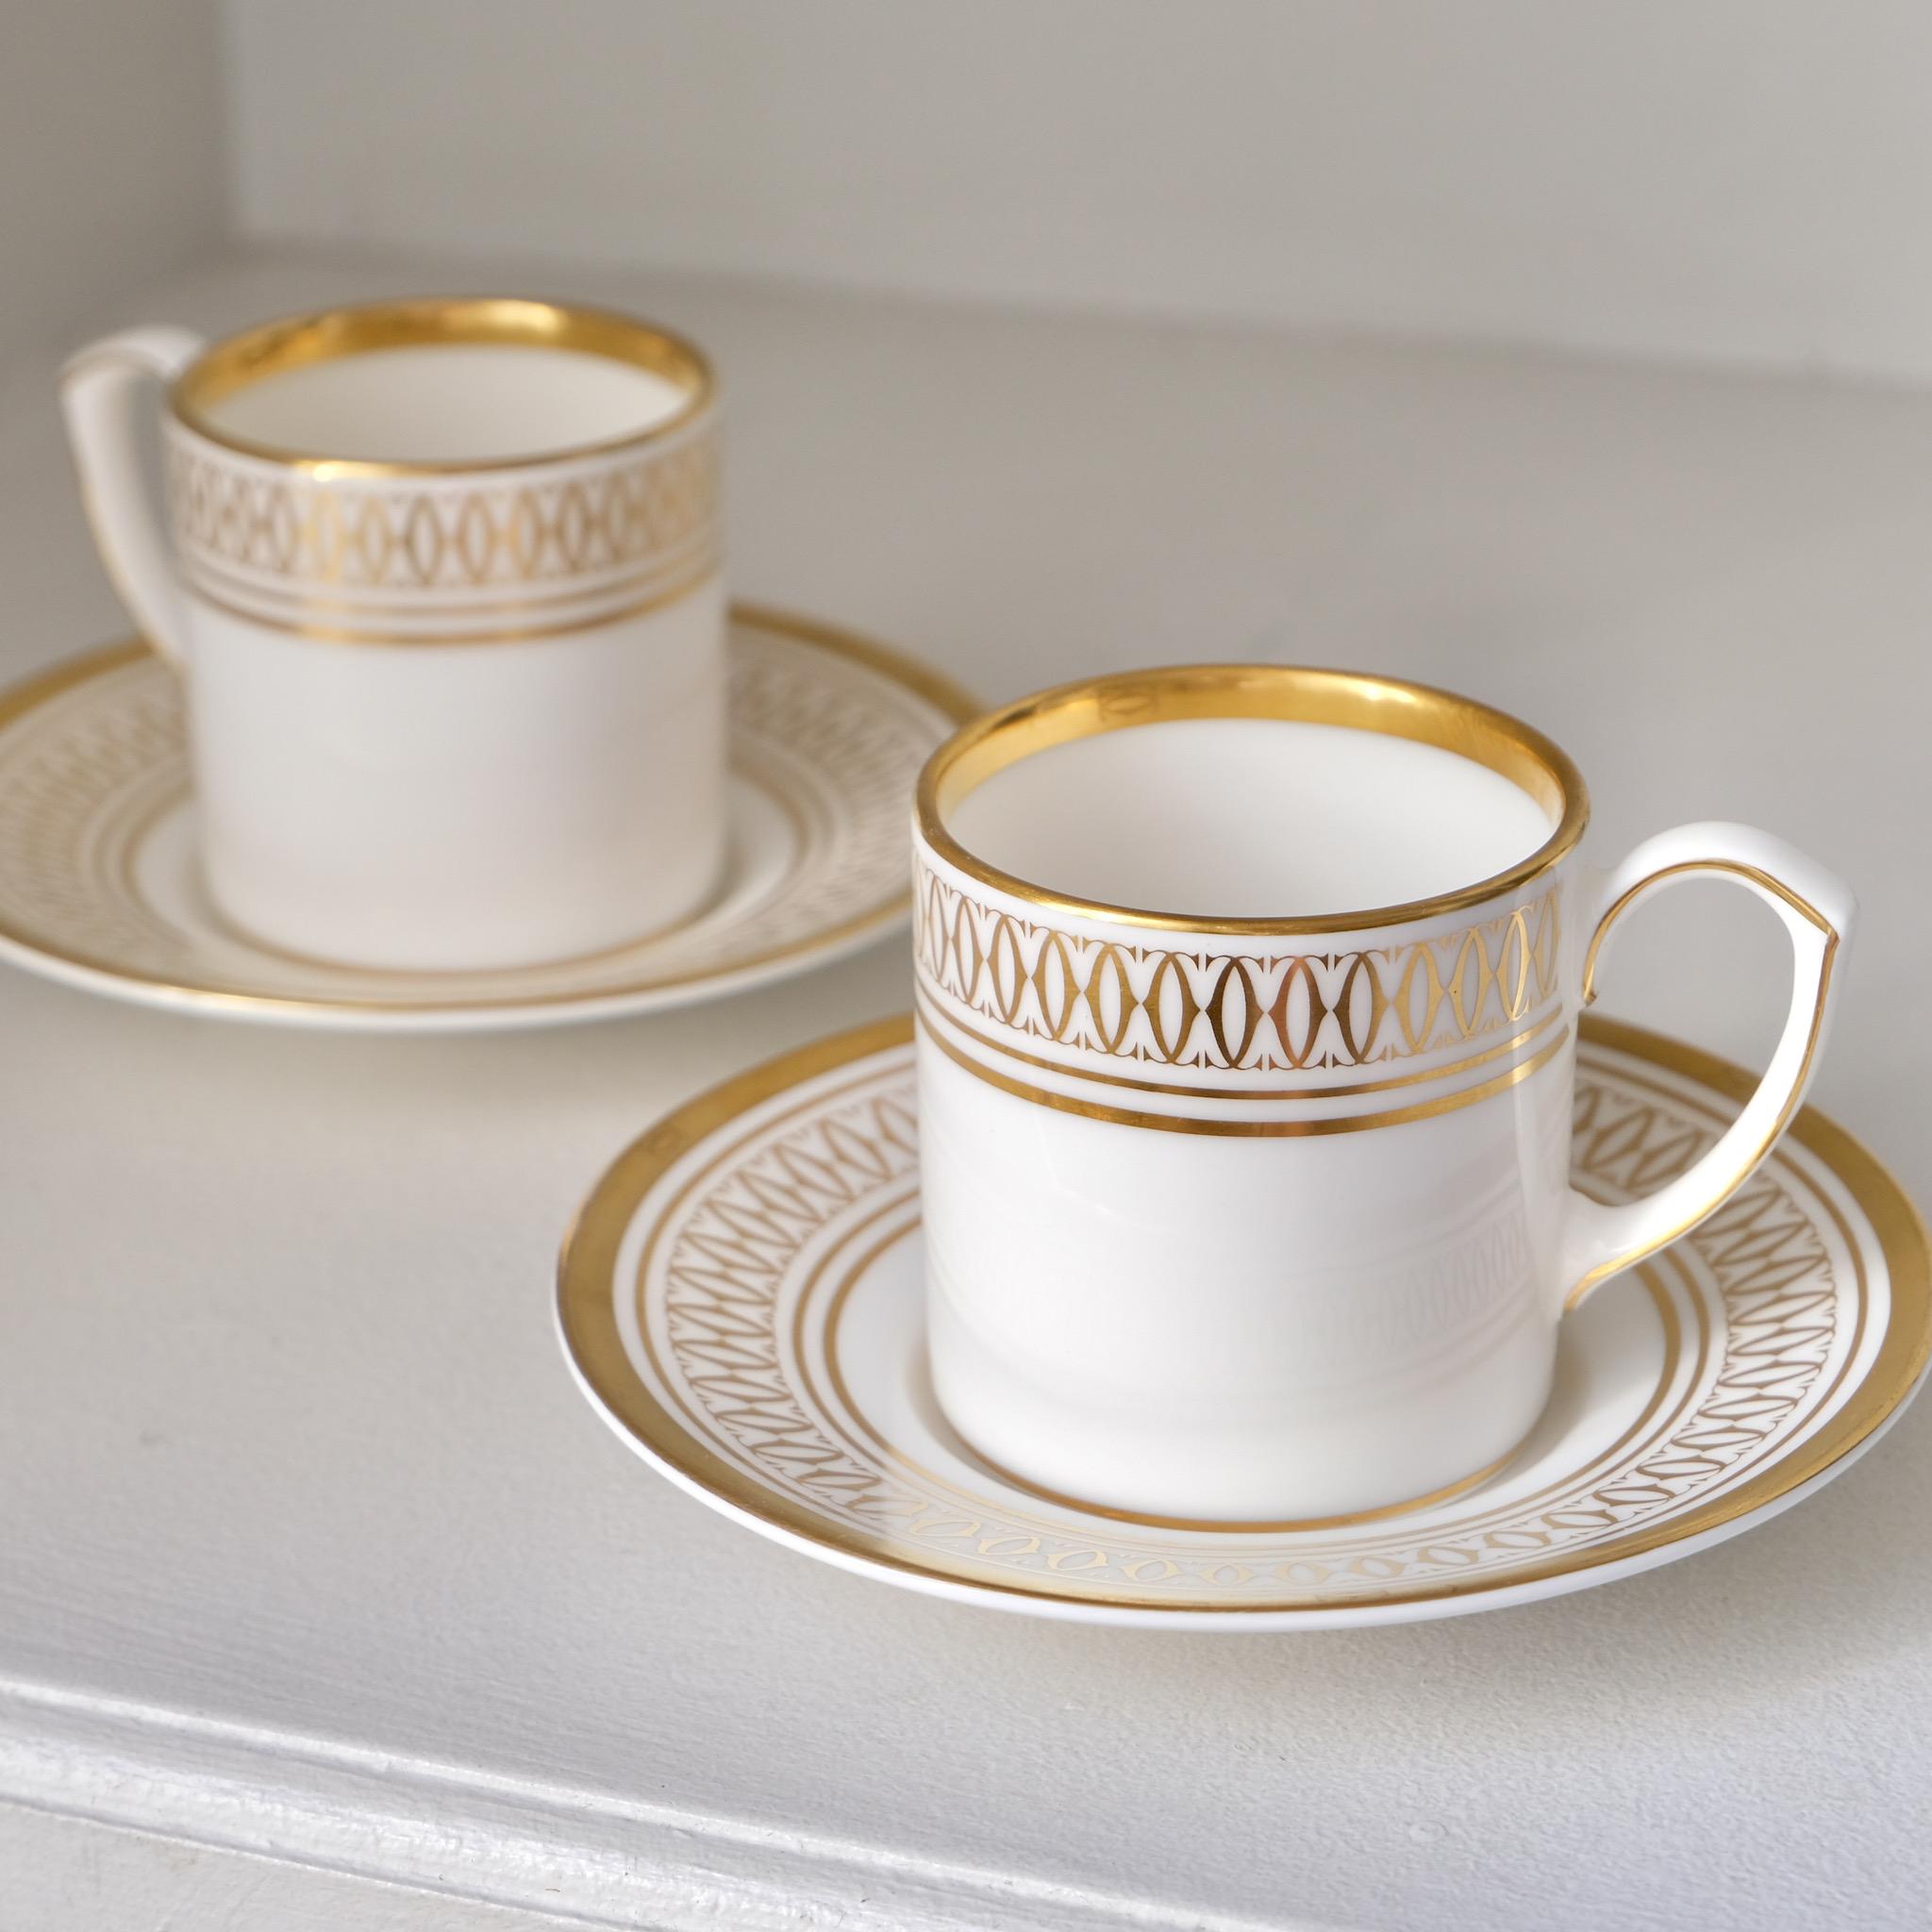 cartier coffee and tea set for two la porte bonheur